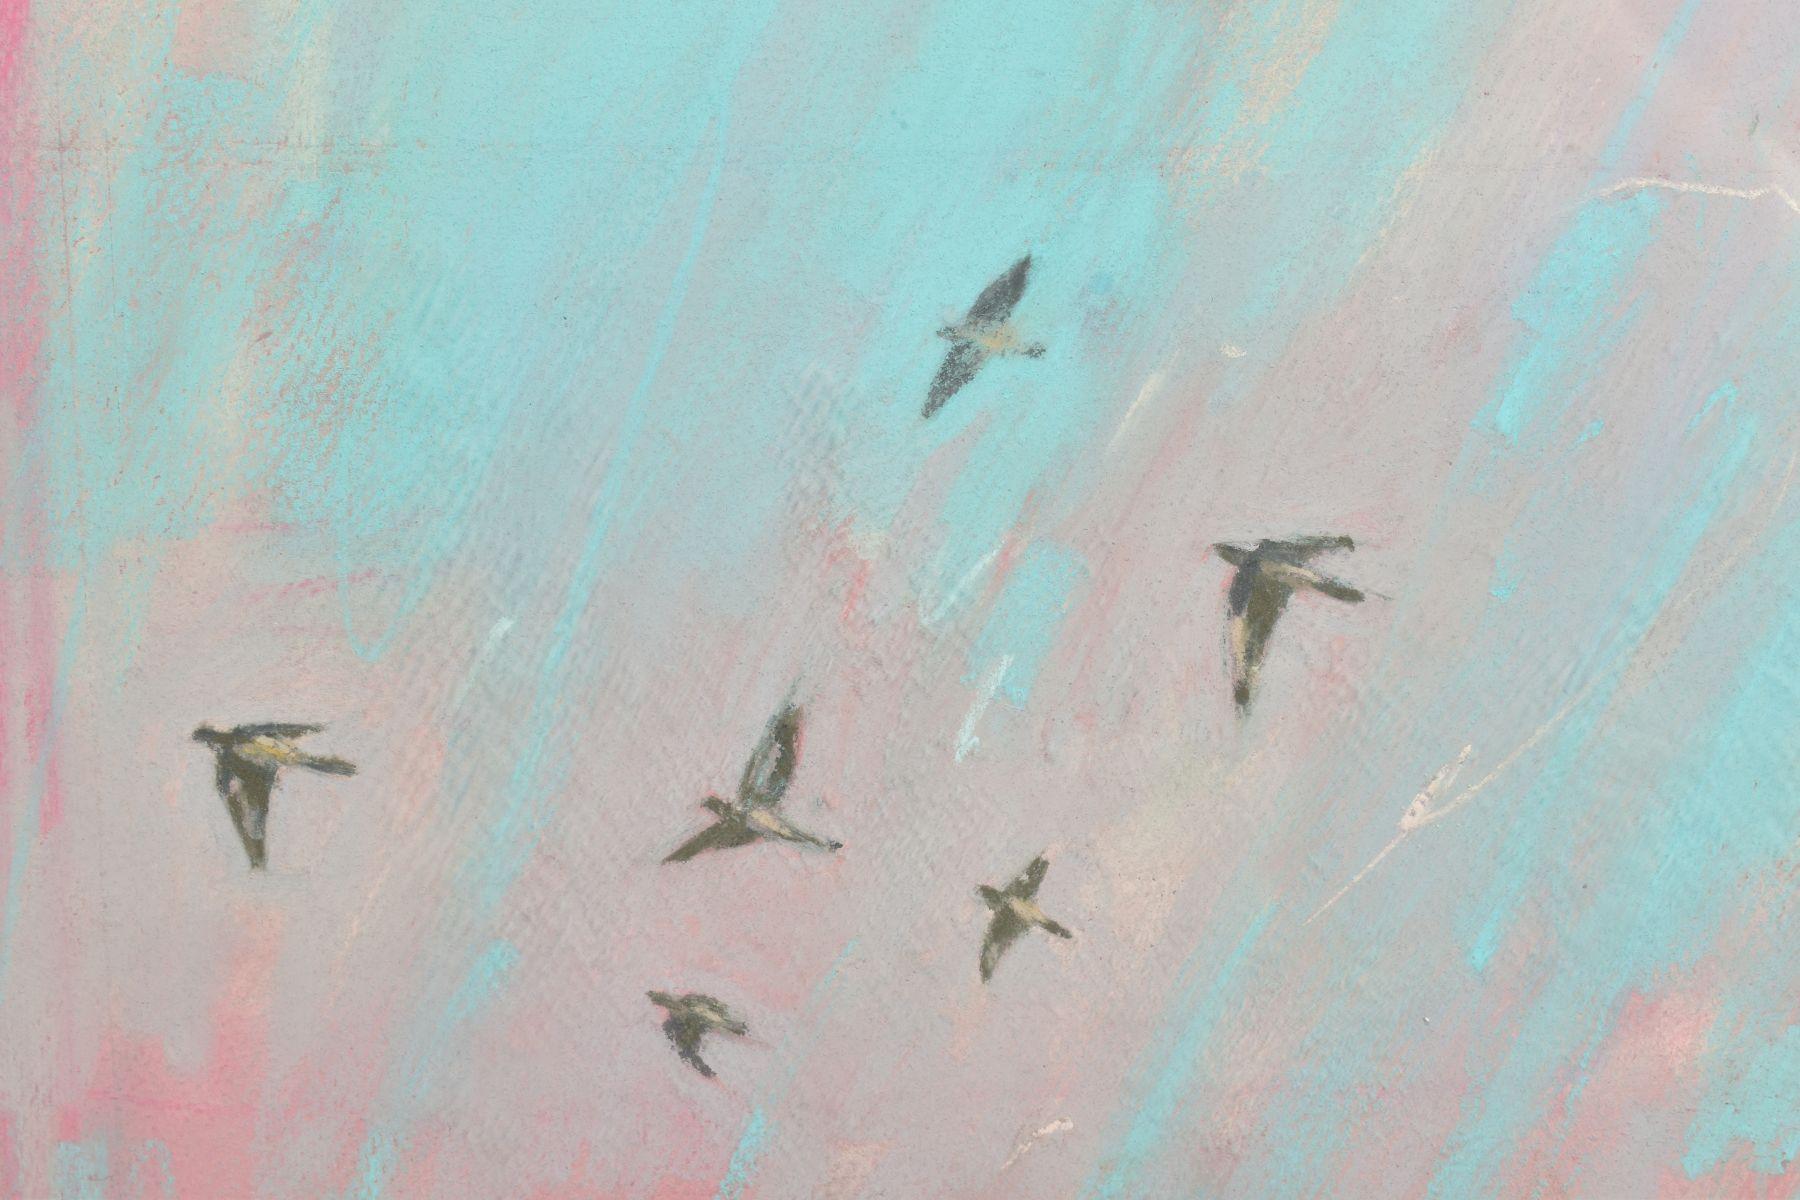 JAMES BARTHOLOMEW (BRITISH CONTEMPORARY), 'Woodpigeons and Rooster', signed bottom left, mixed media - Image 3 of 7